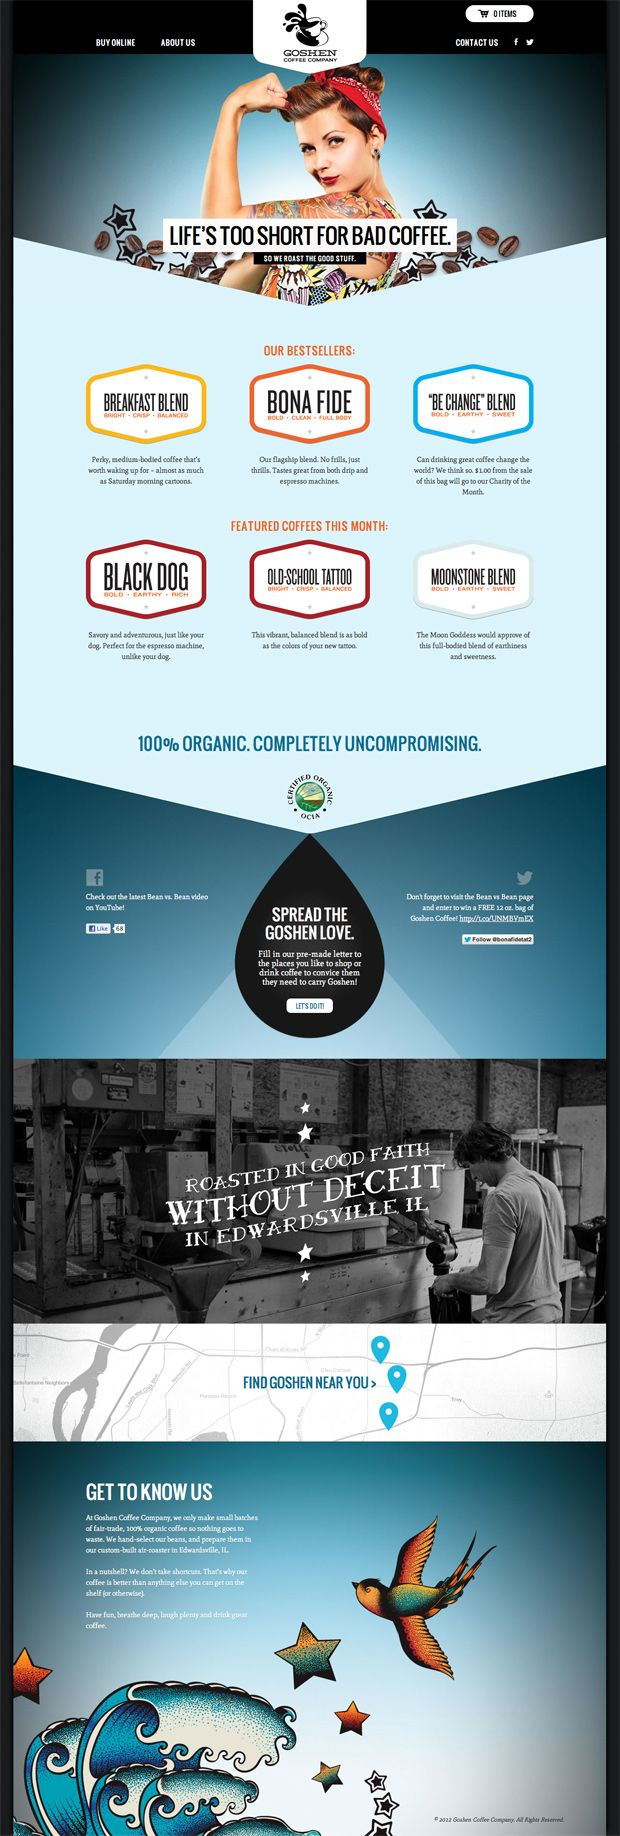 223 best Web design images on Pinterest | Website layout, Page ...